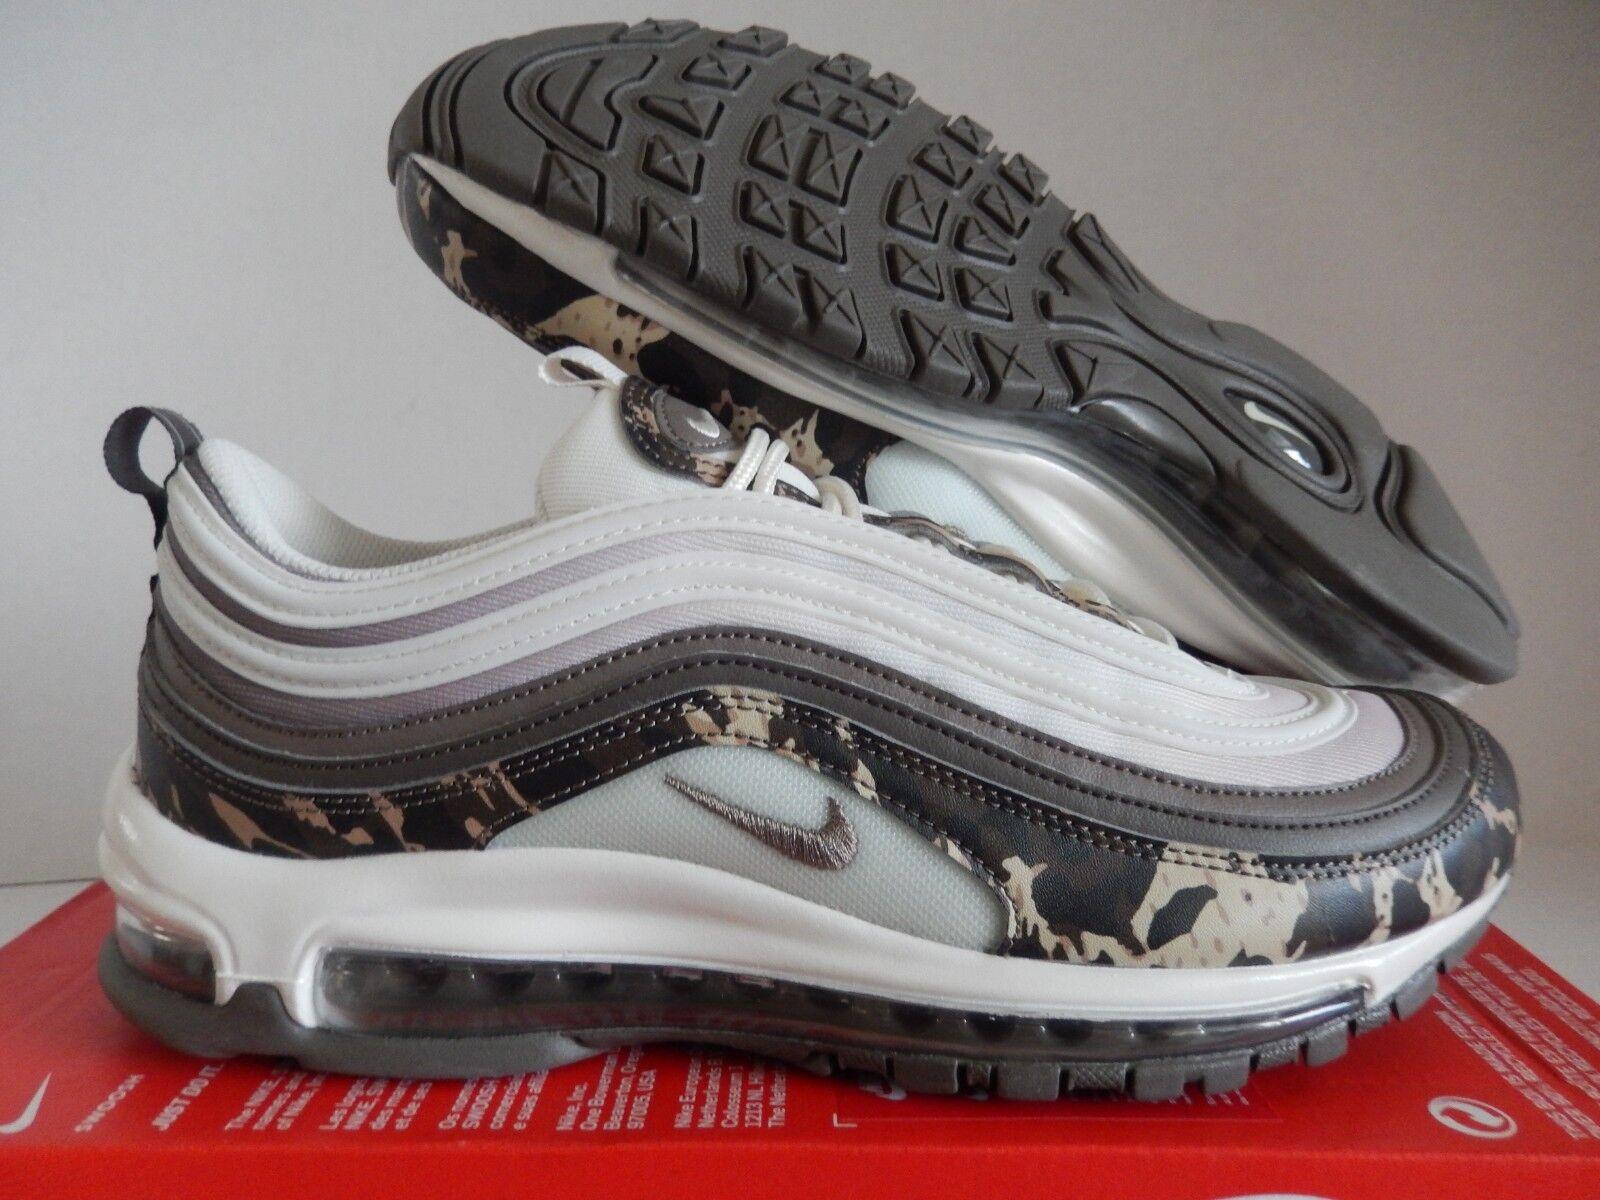 Wmns Nike Air Max 97 Premium Ridgerock-Visón Marrón    camuflaje  Talla 10  descuento